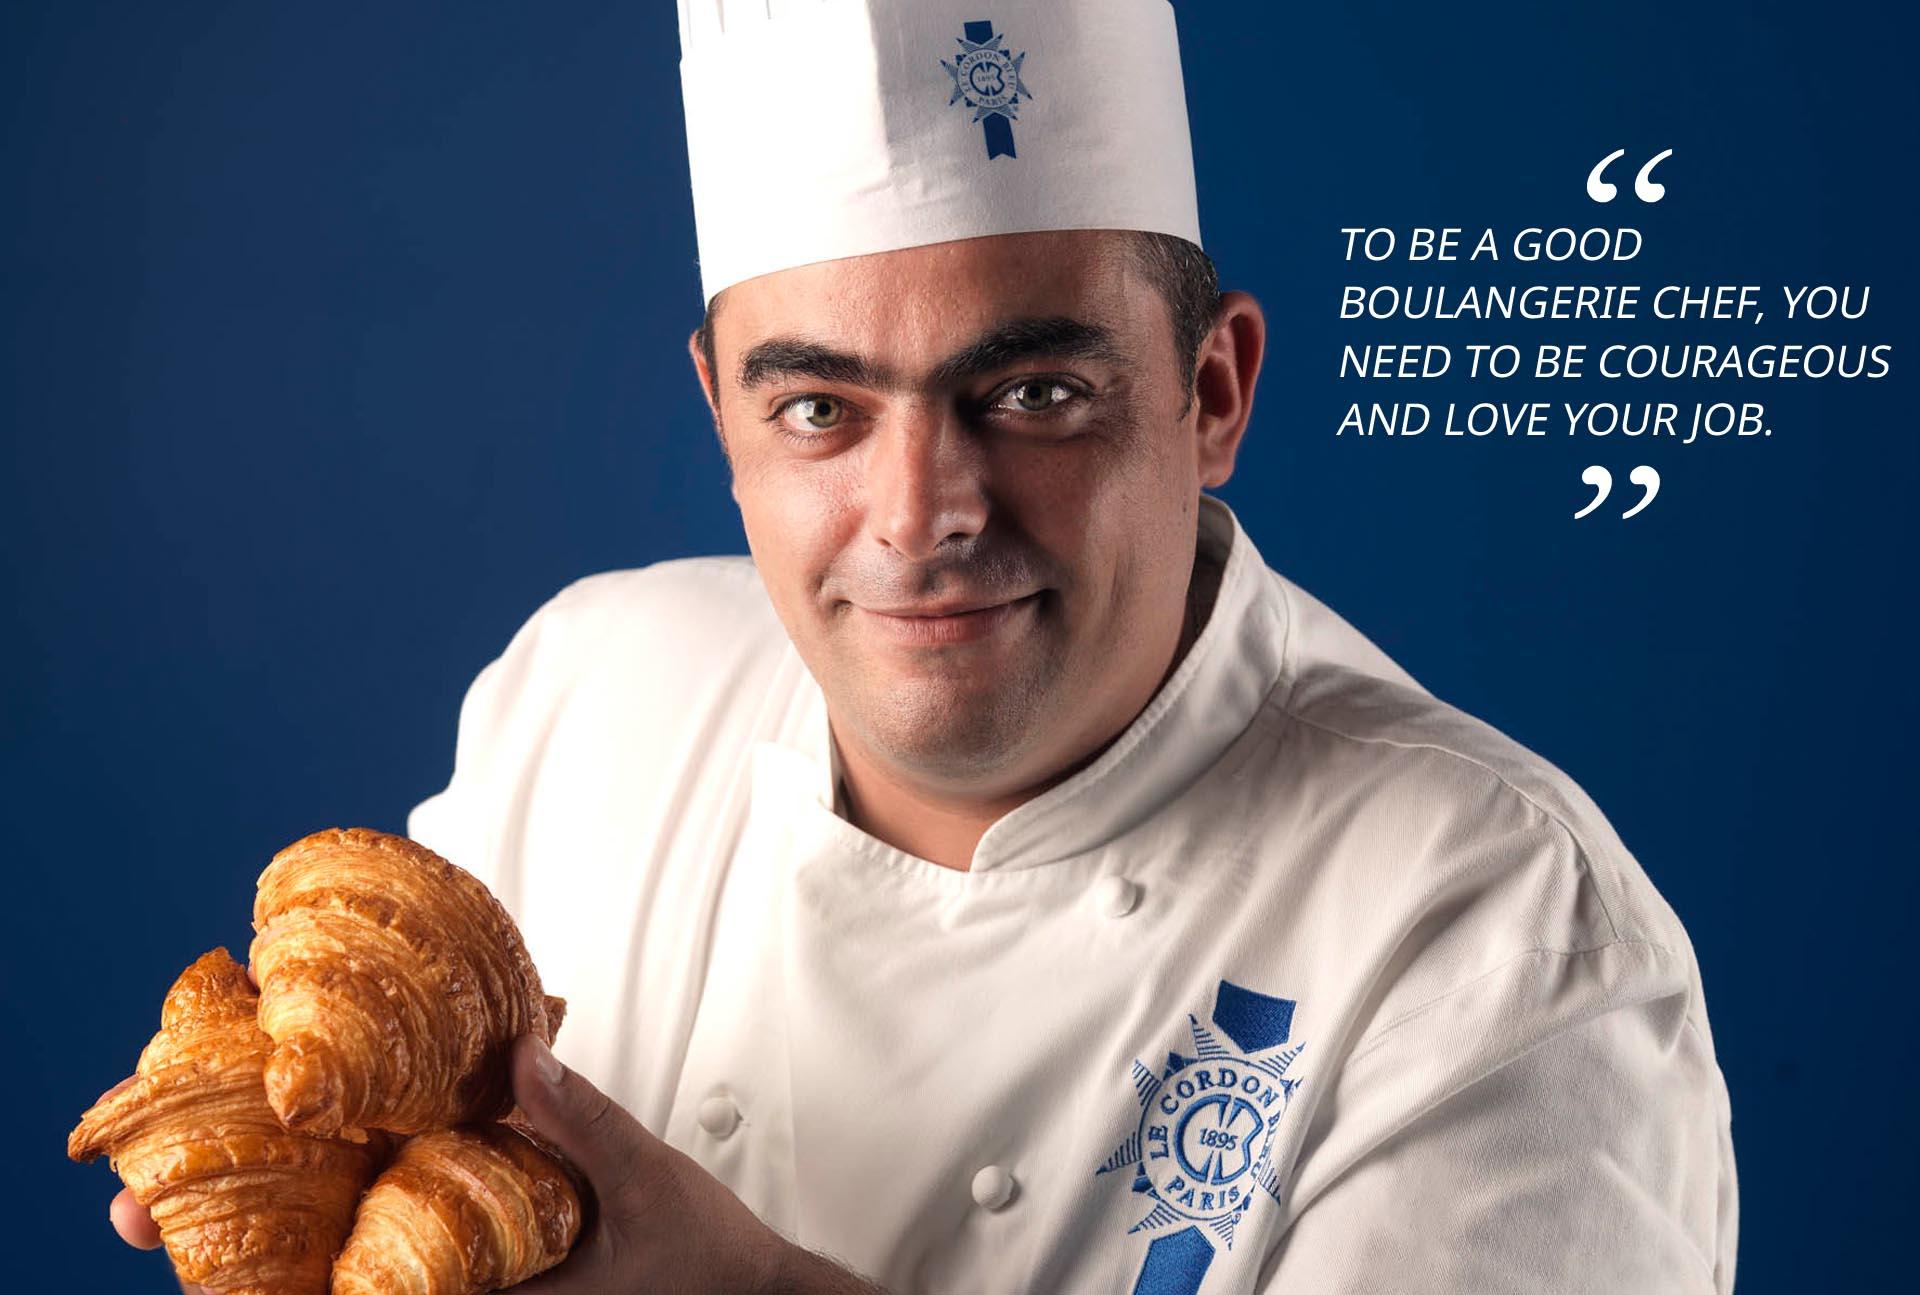 Boulangerie Chef Vincent Somoza